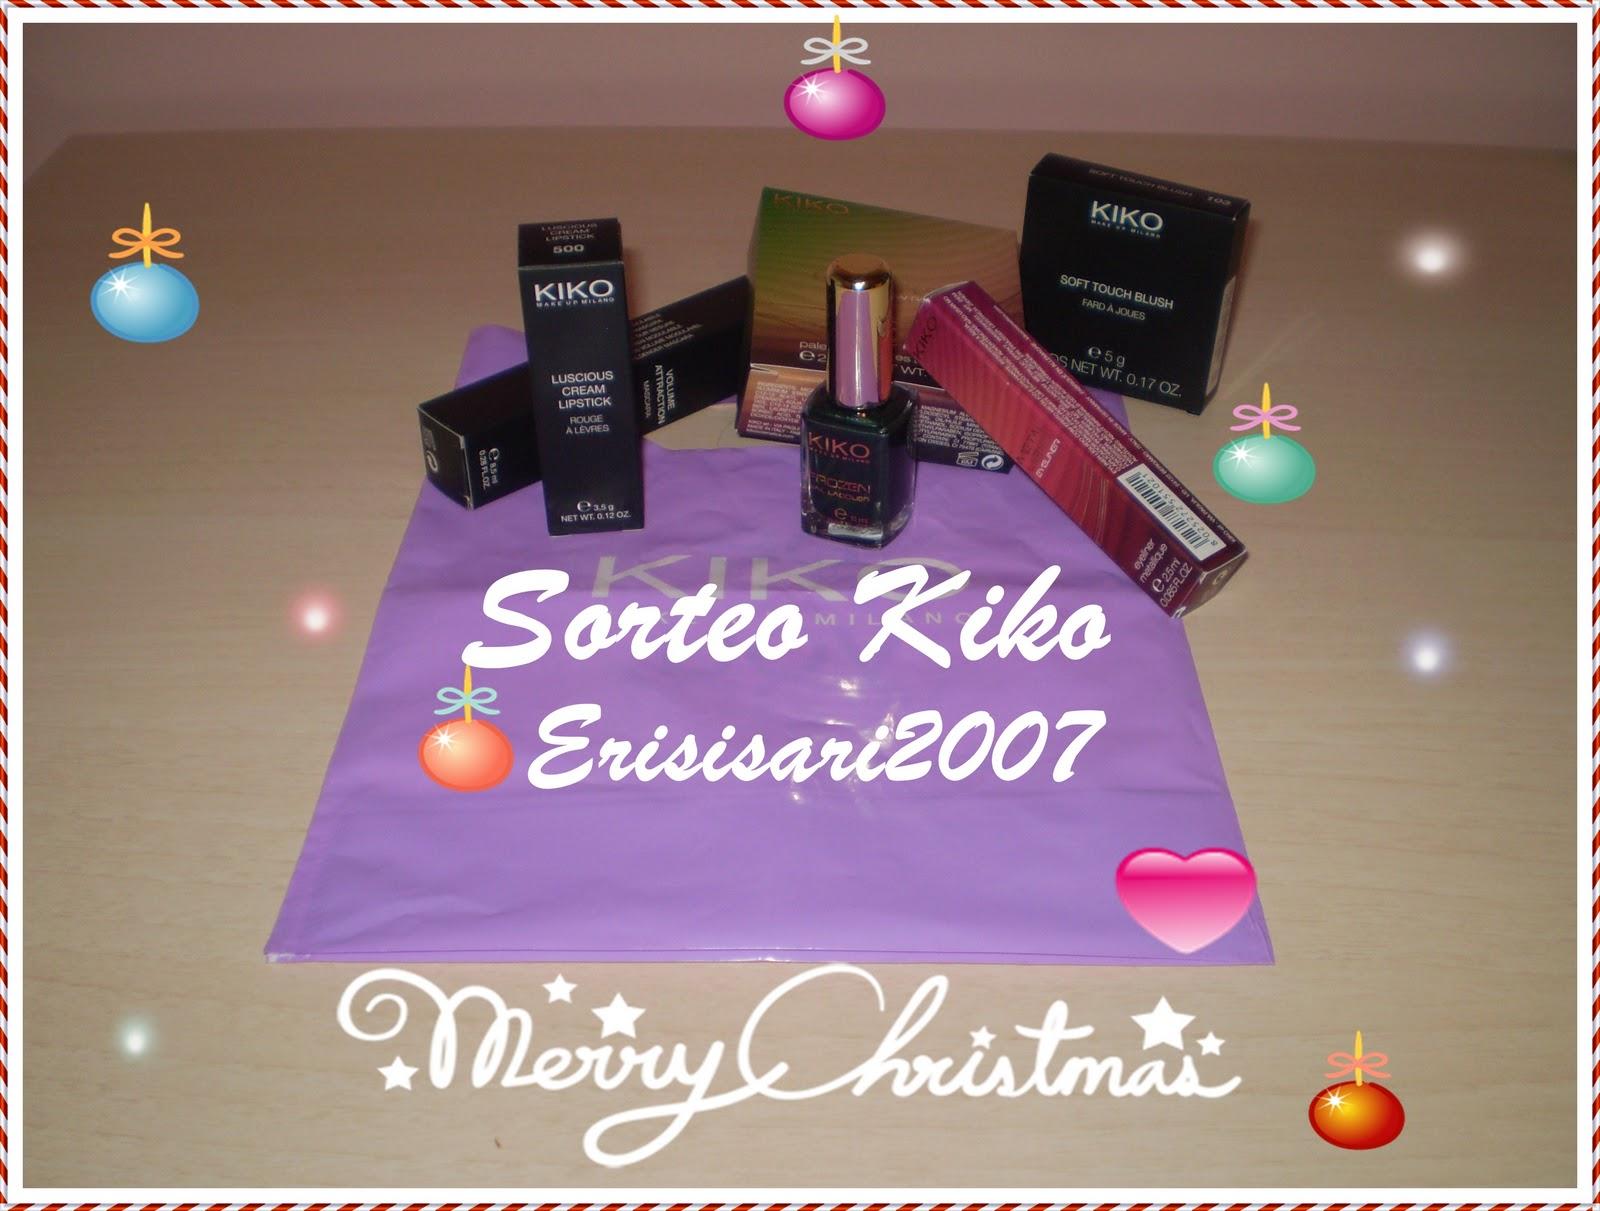 SORTEO - 06.01.12